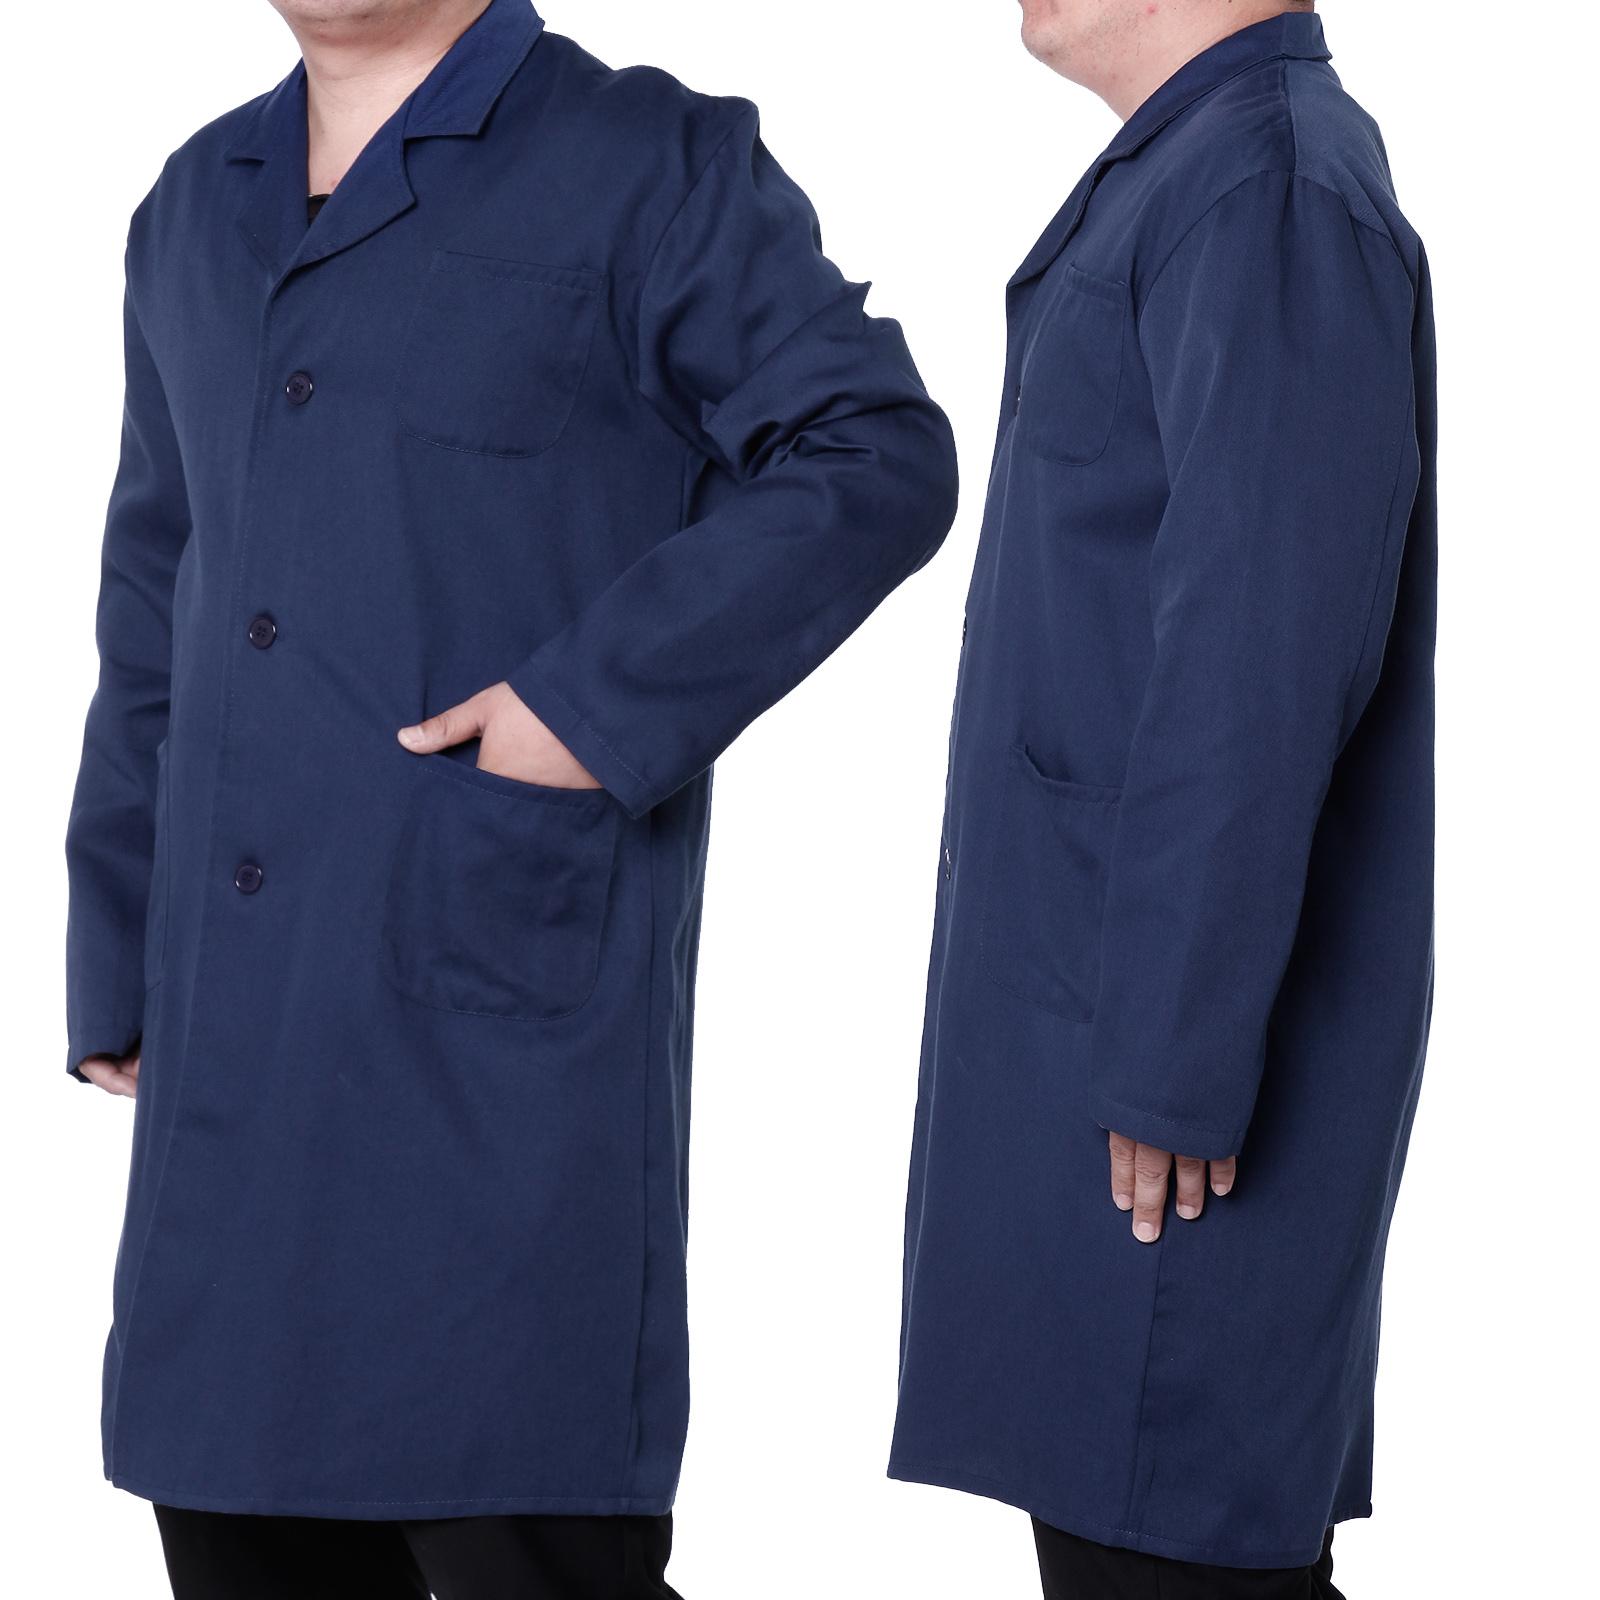 Blue Lab Coat Jacket Doctor Hospital Warehouse Food